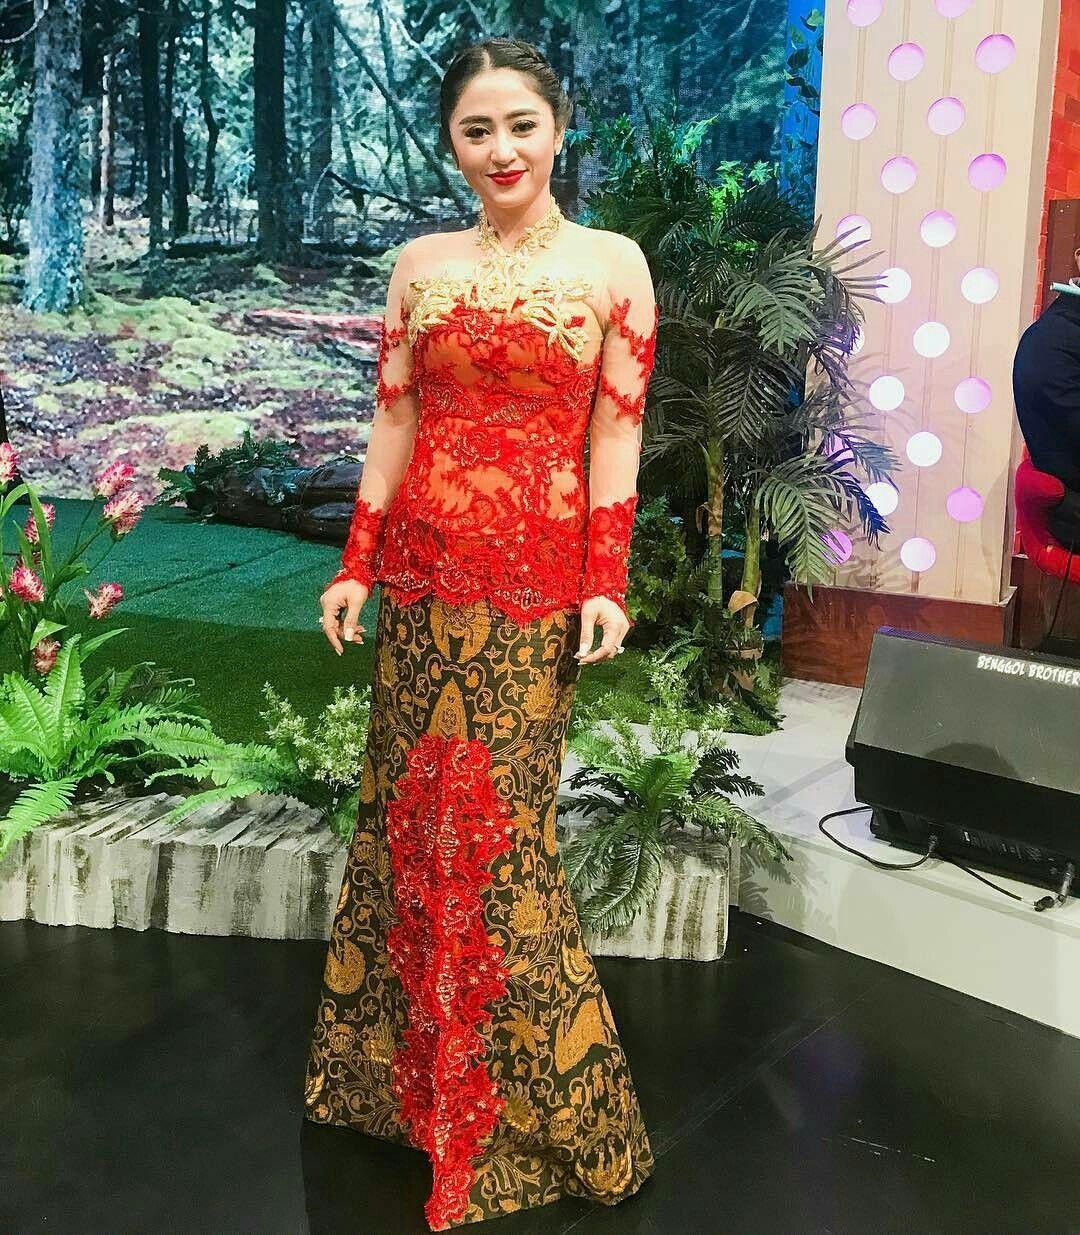 Pin by henny on kebayabatikdress seleb pinterest batik dress